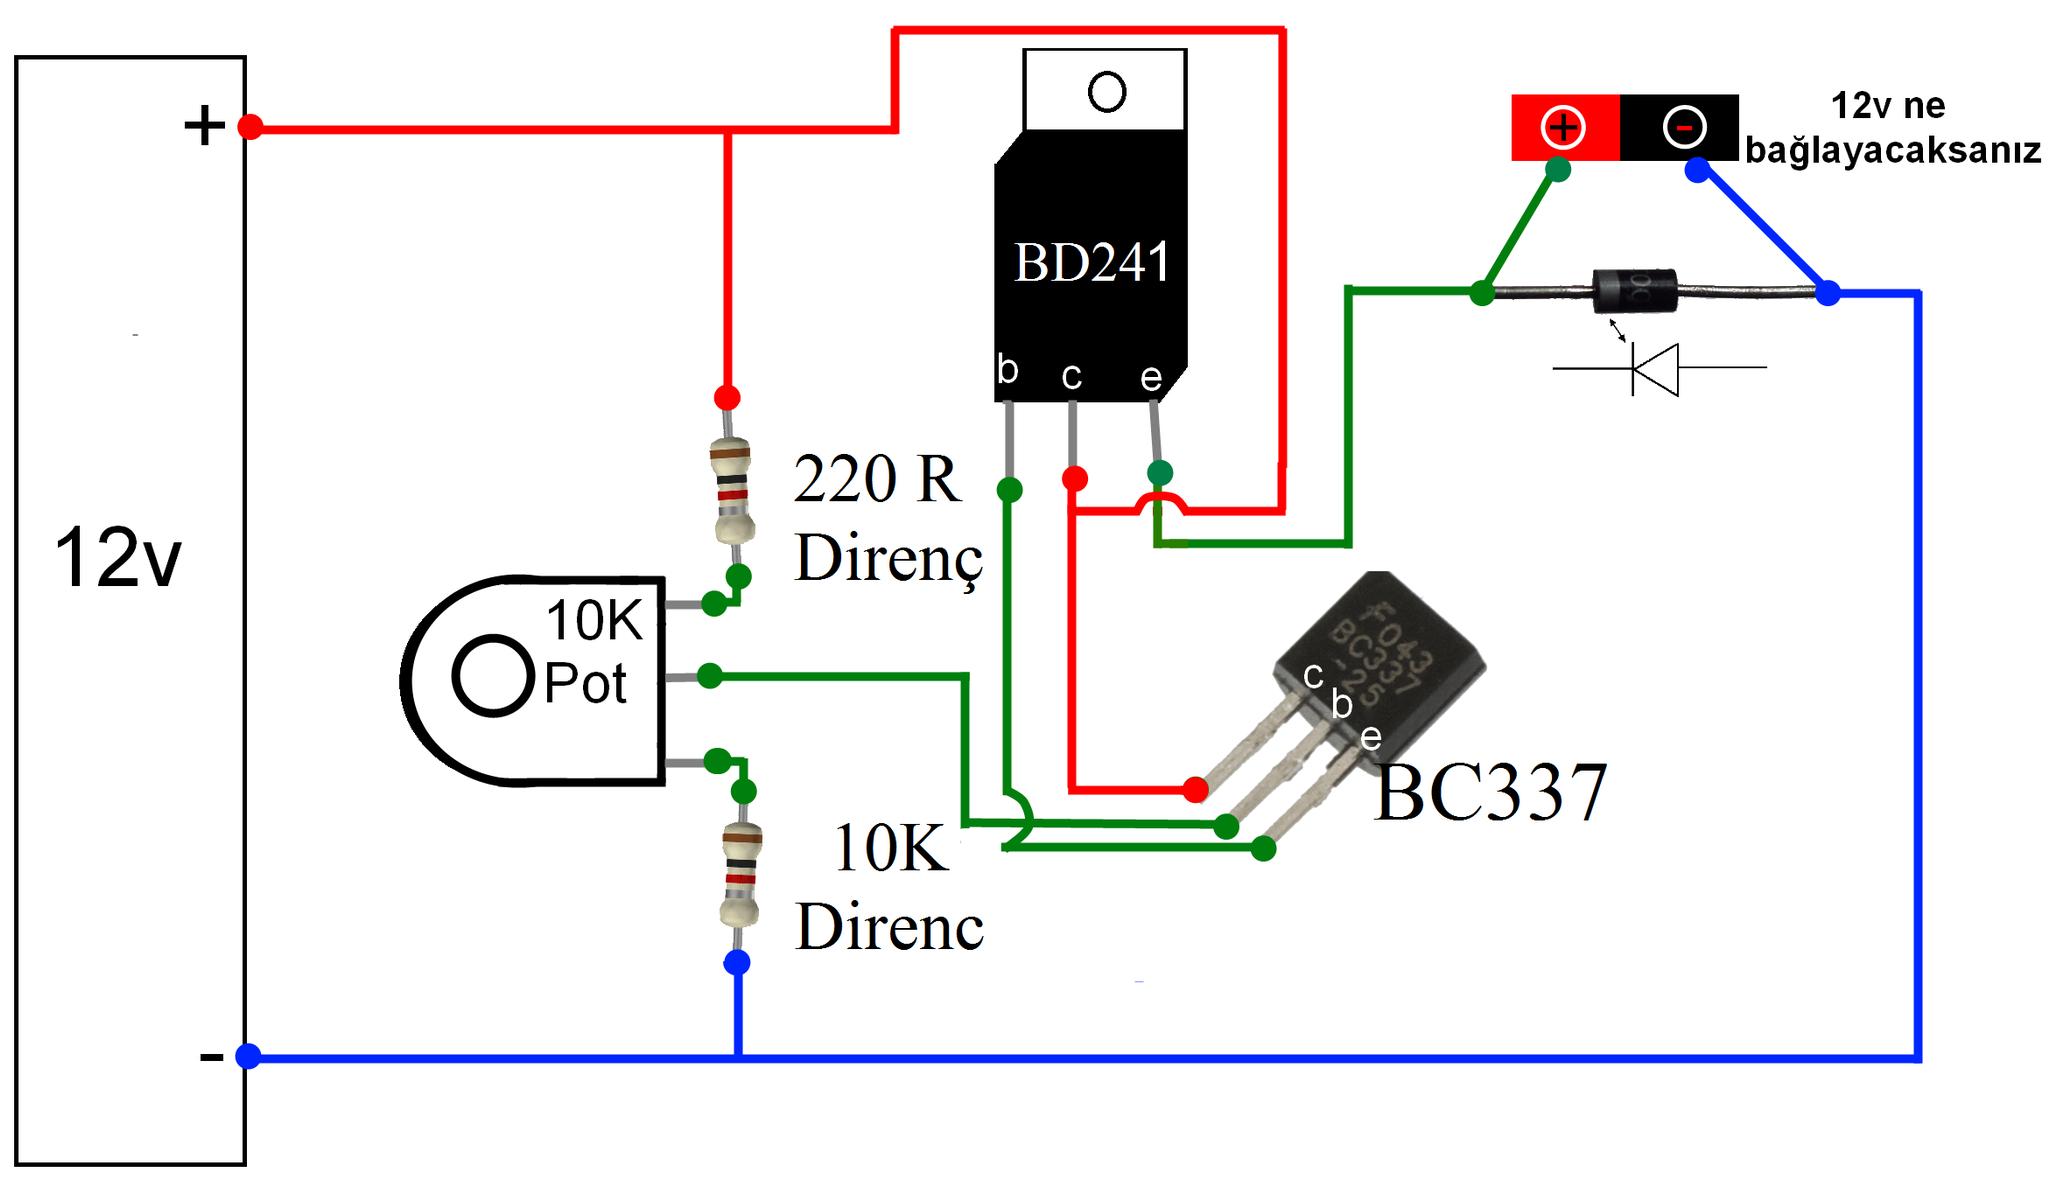 Radio Shack Potentiometer Wiring | Wiring Diagram - Potentiometer Wiring Diagram